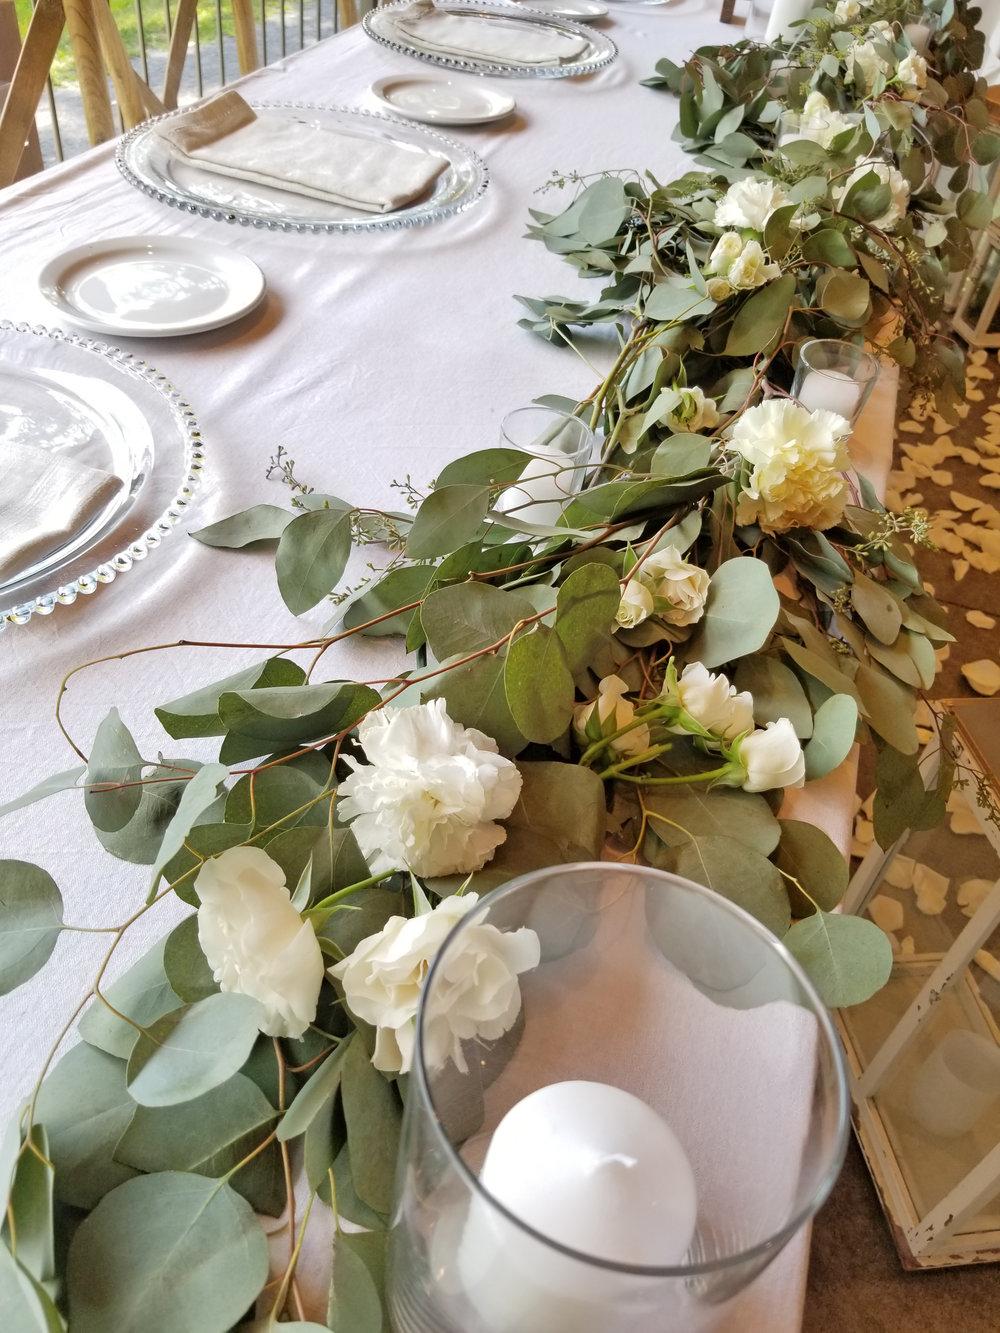 Natural Organic Montreal Wedding Pointe du Moulin Florist Flowers 20180819_153928.jpg